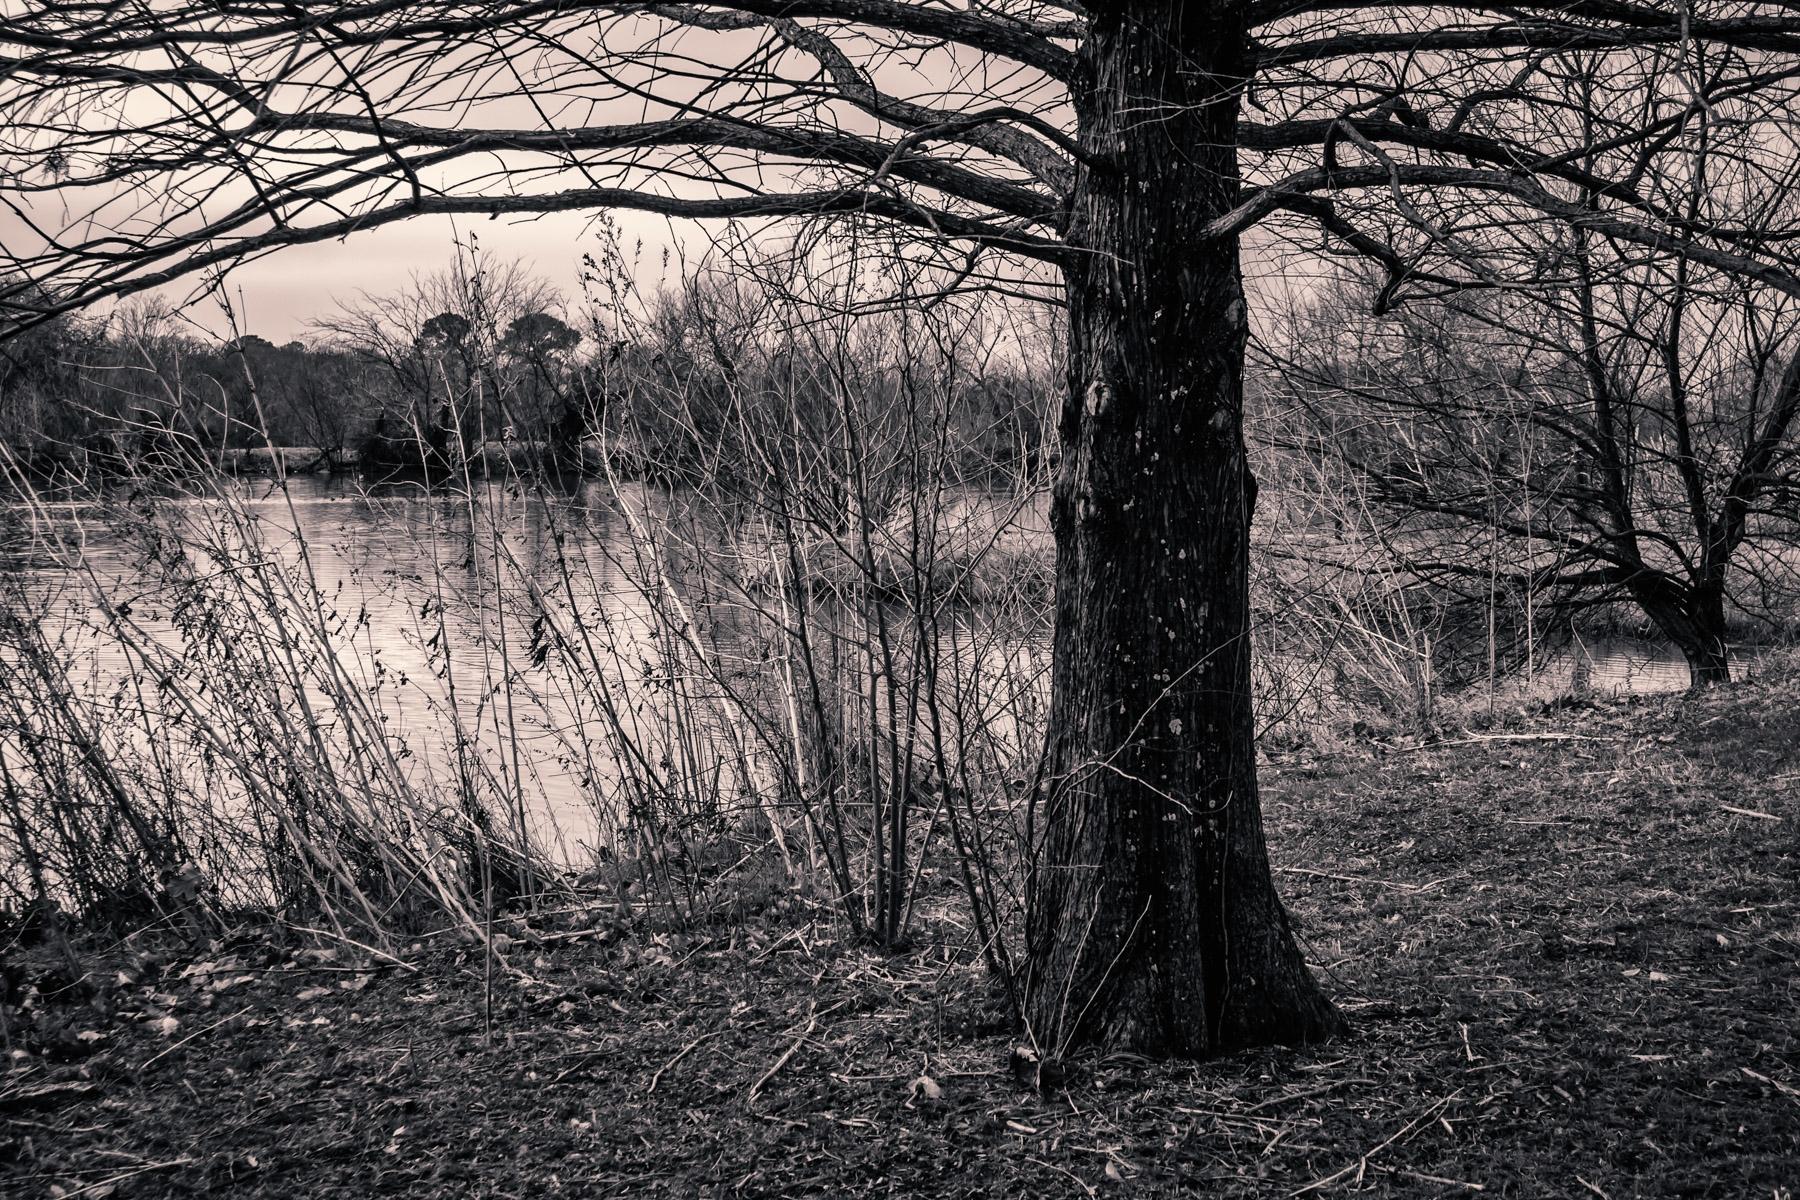 denton unt pond trees.jpg